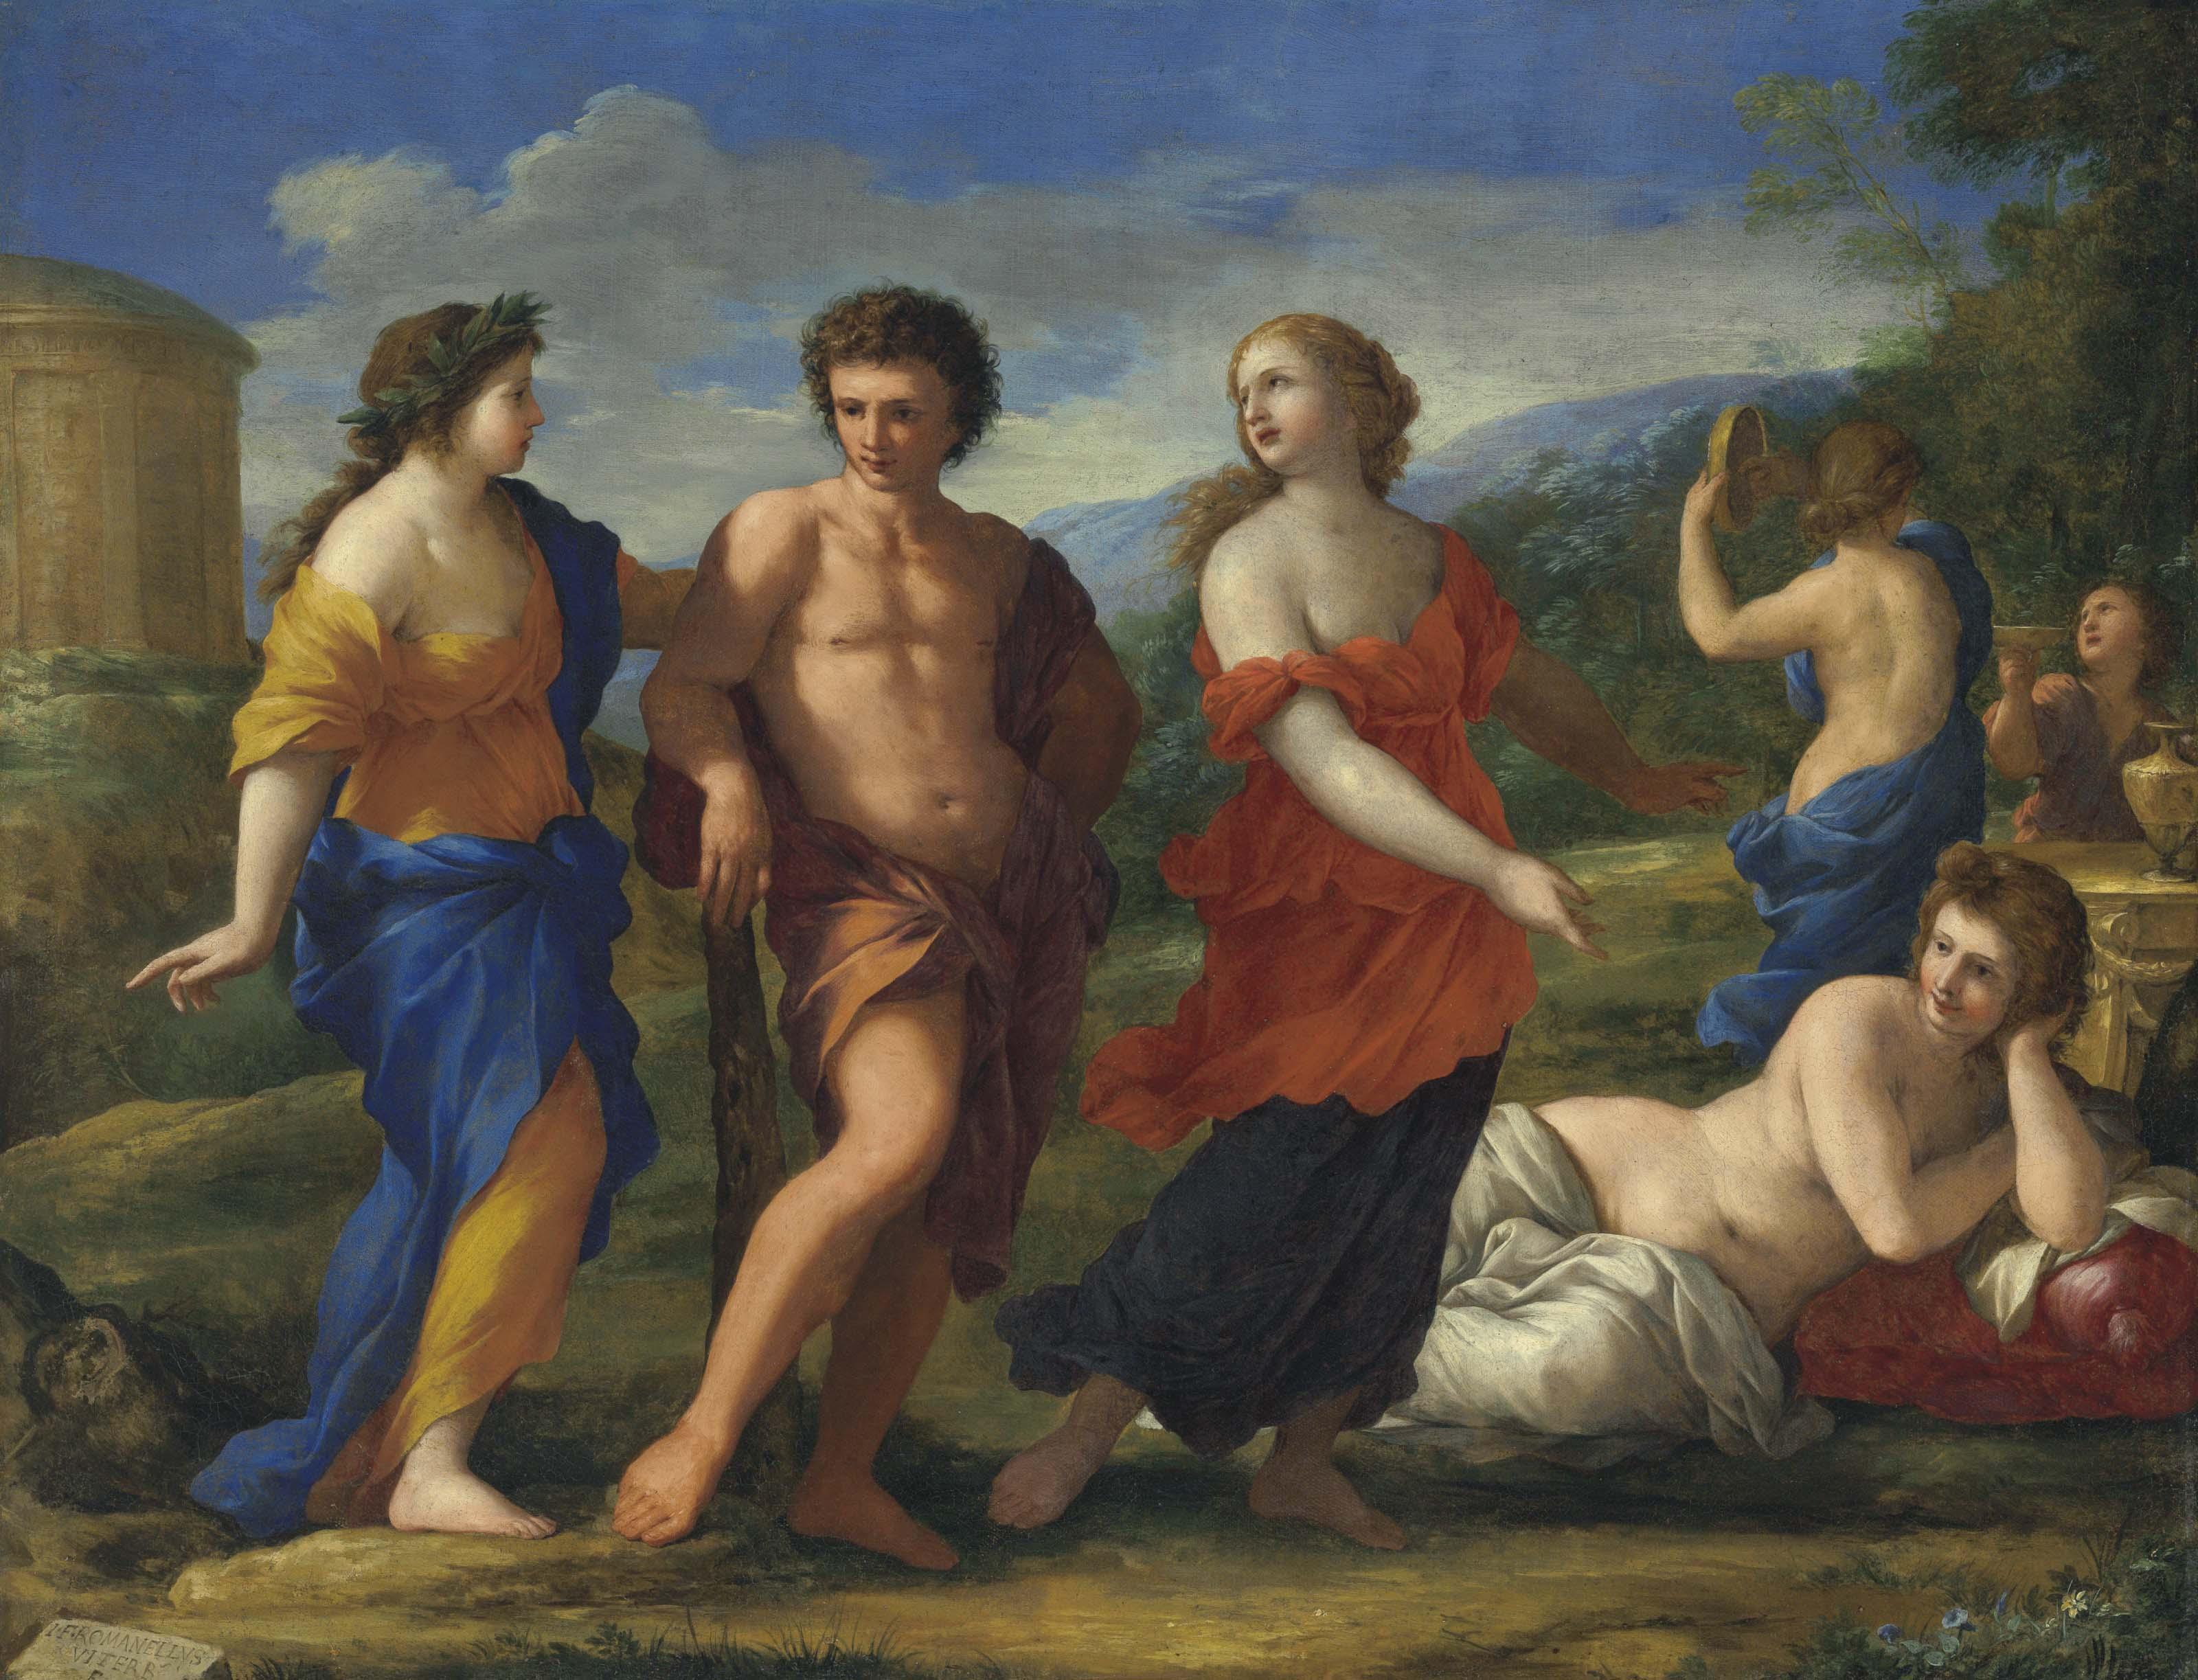 Giovanni Francesco Romanelli (Viterbo c. 1610-1662)